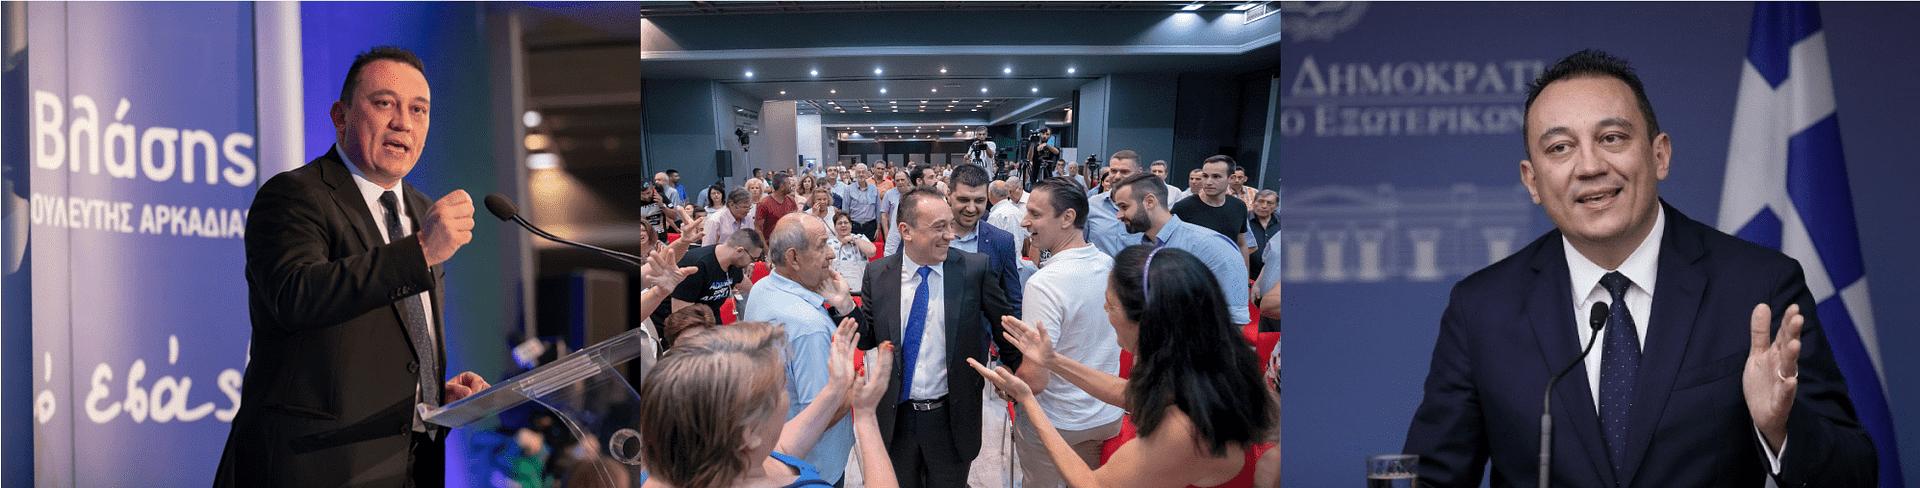 kostas vlasis carouses lpuzzle 2 new | Κώστας Βλάσης | Βουλευτής Αρκαδίας Νέα Δημοκρατία